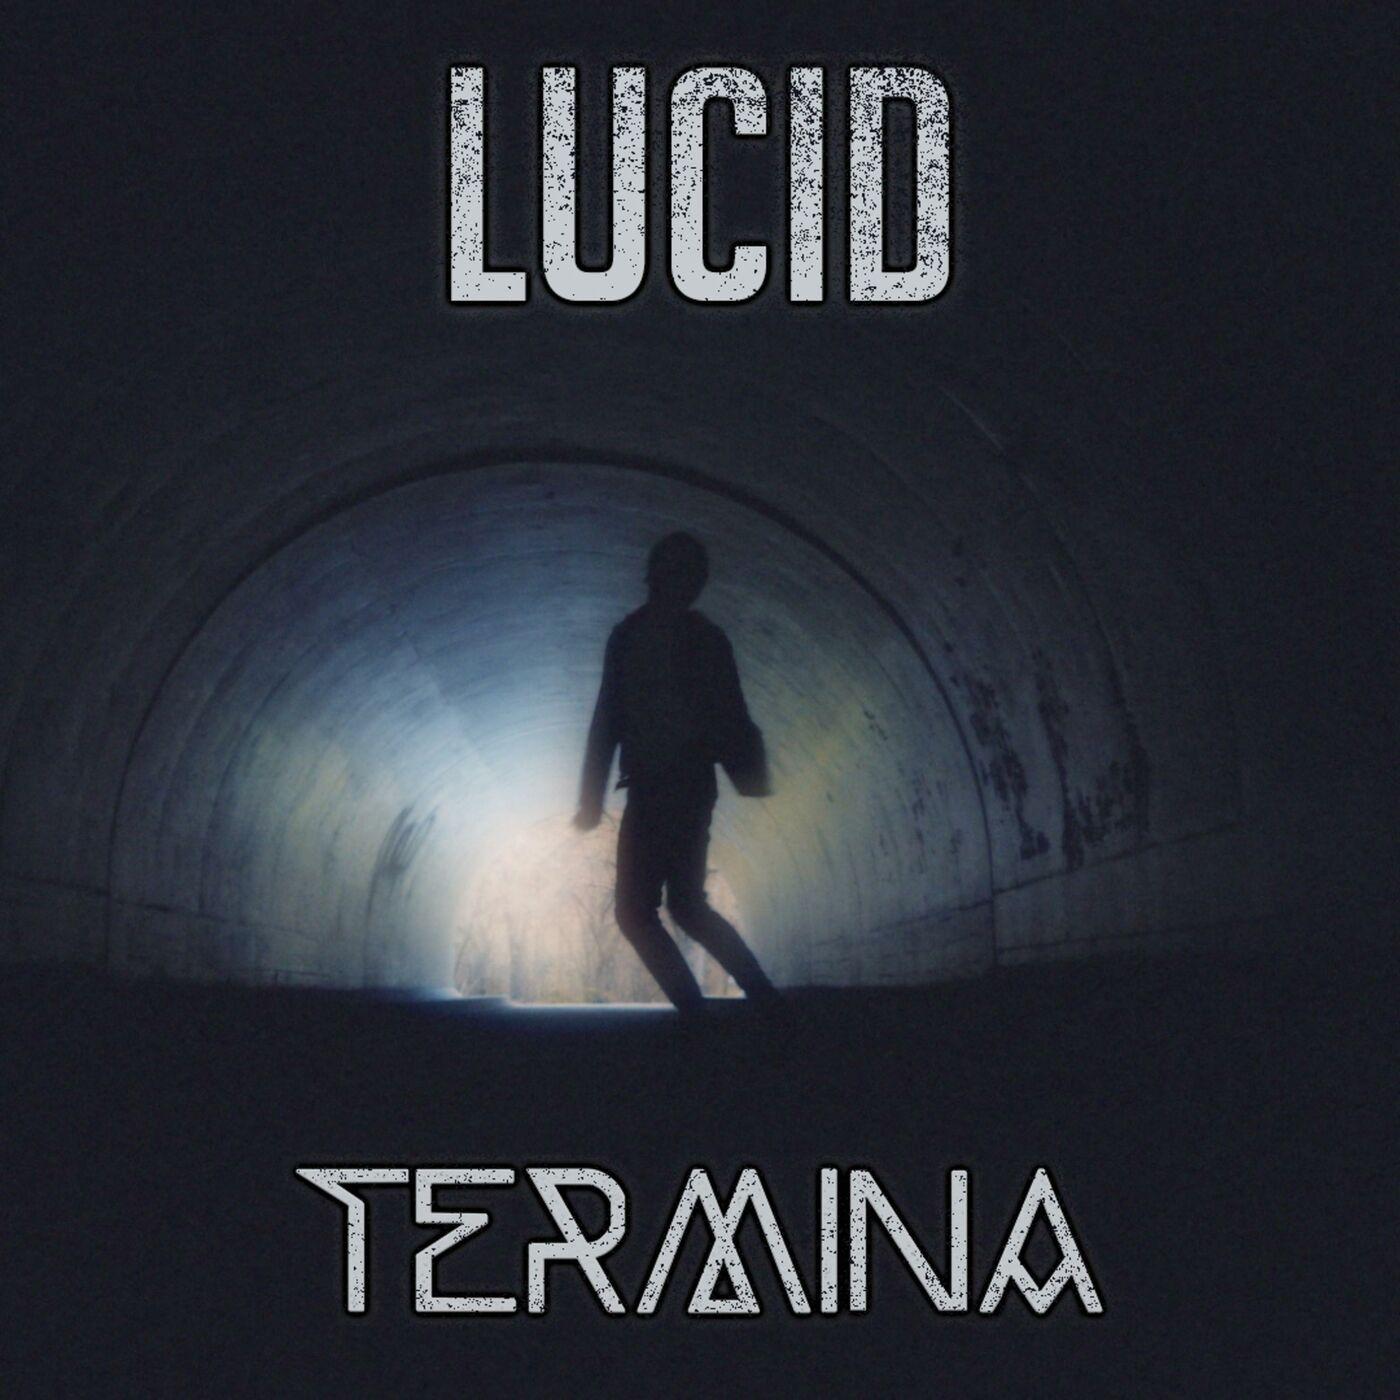 Termina - Lucid [single] (2019)